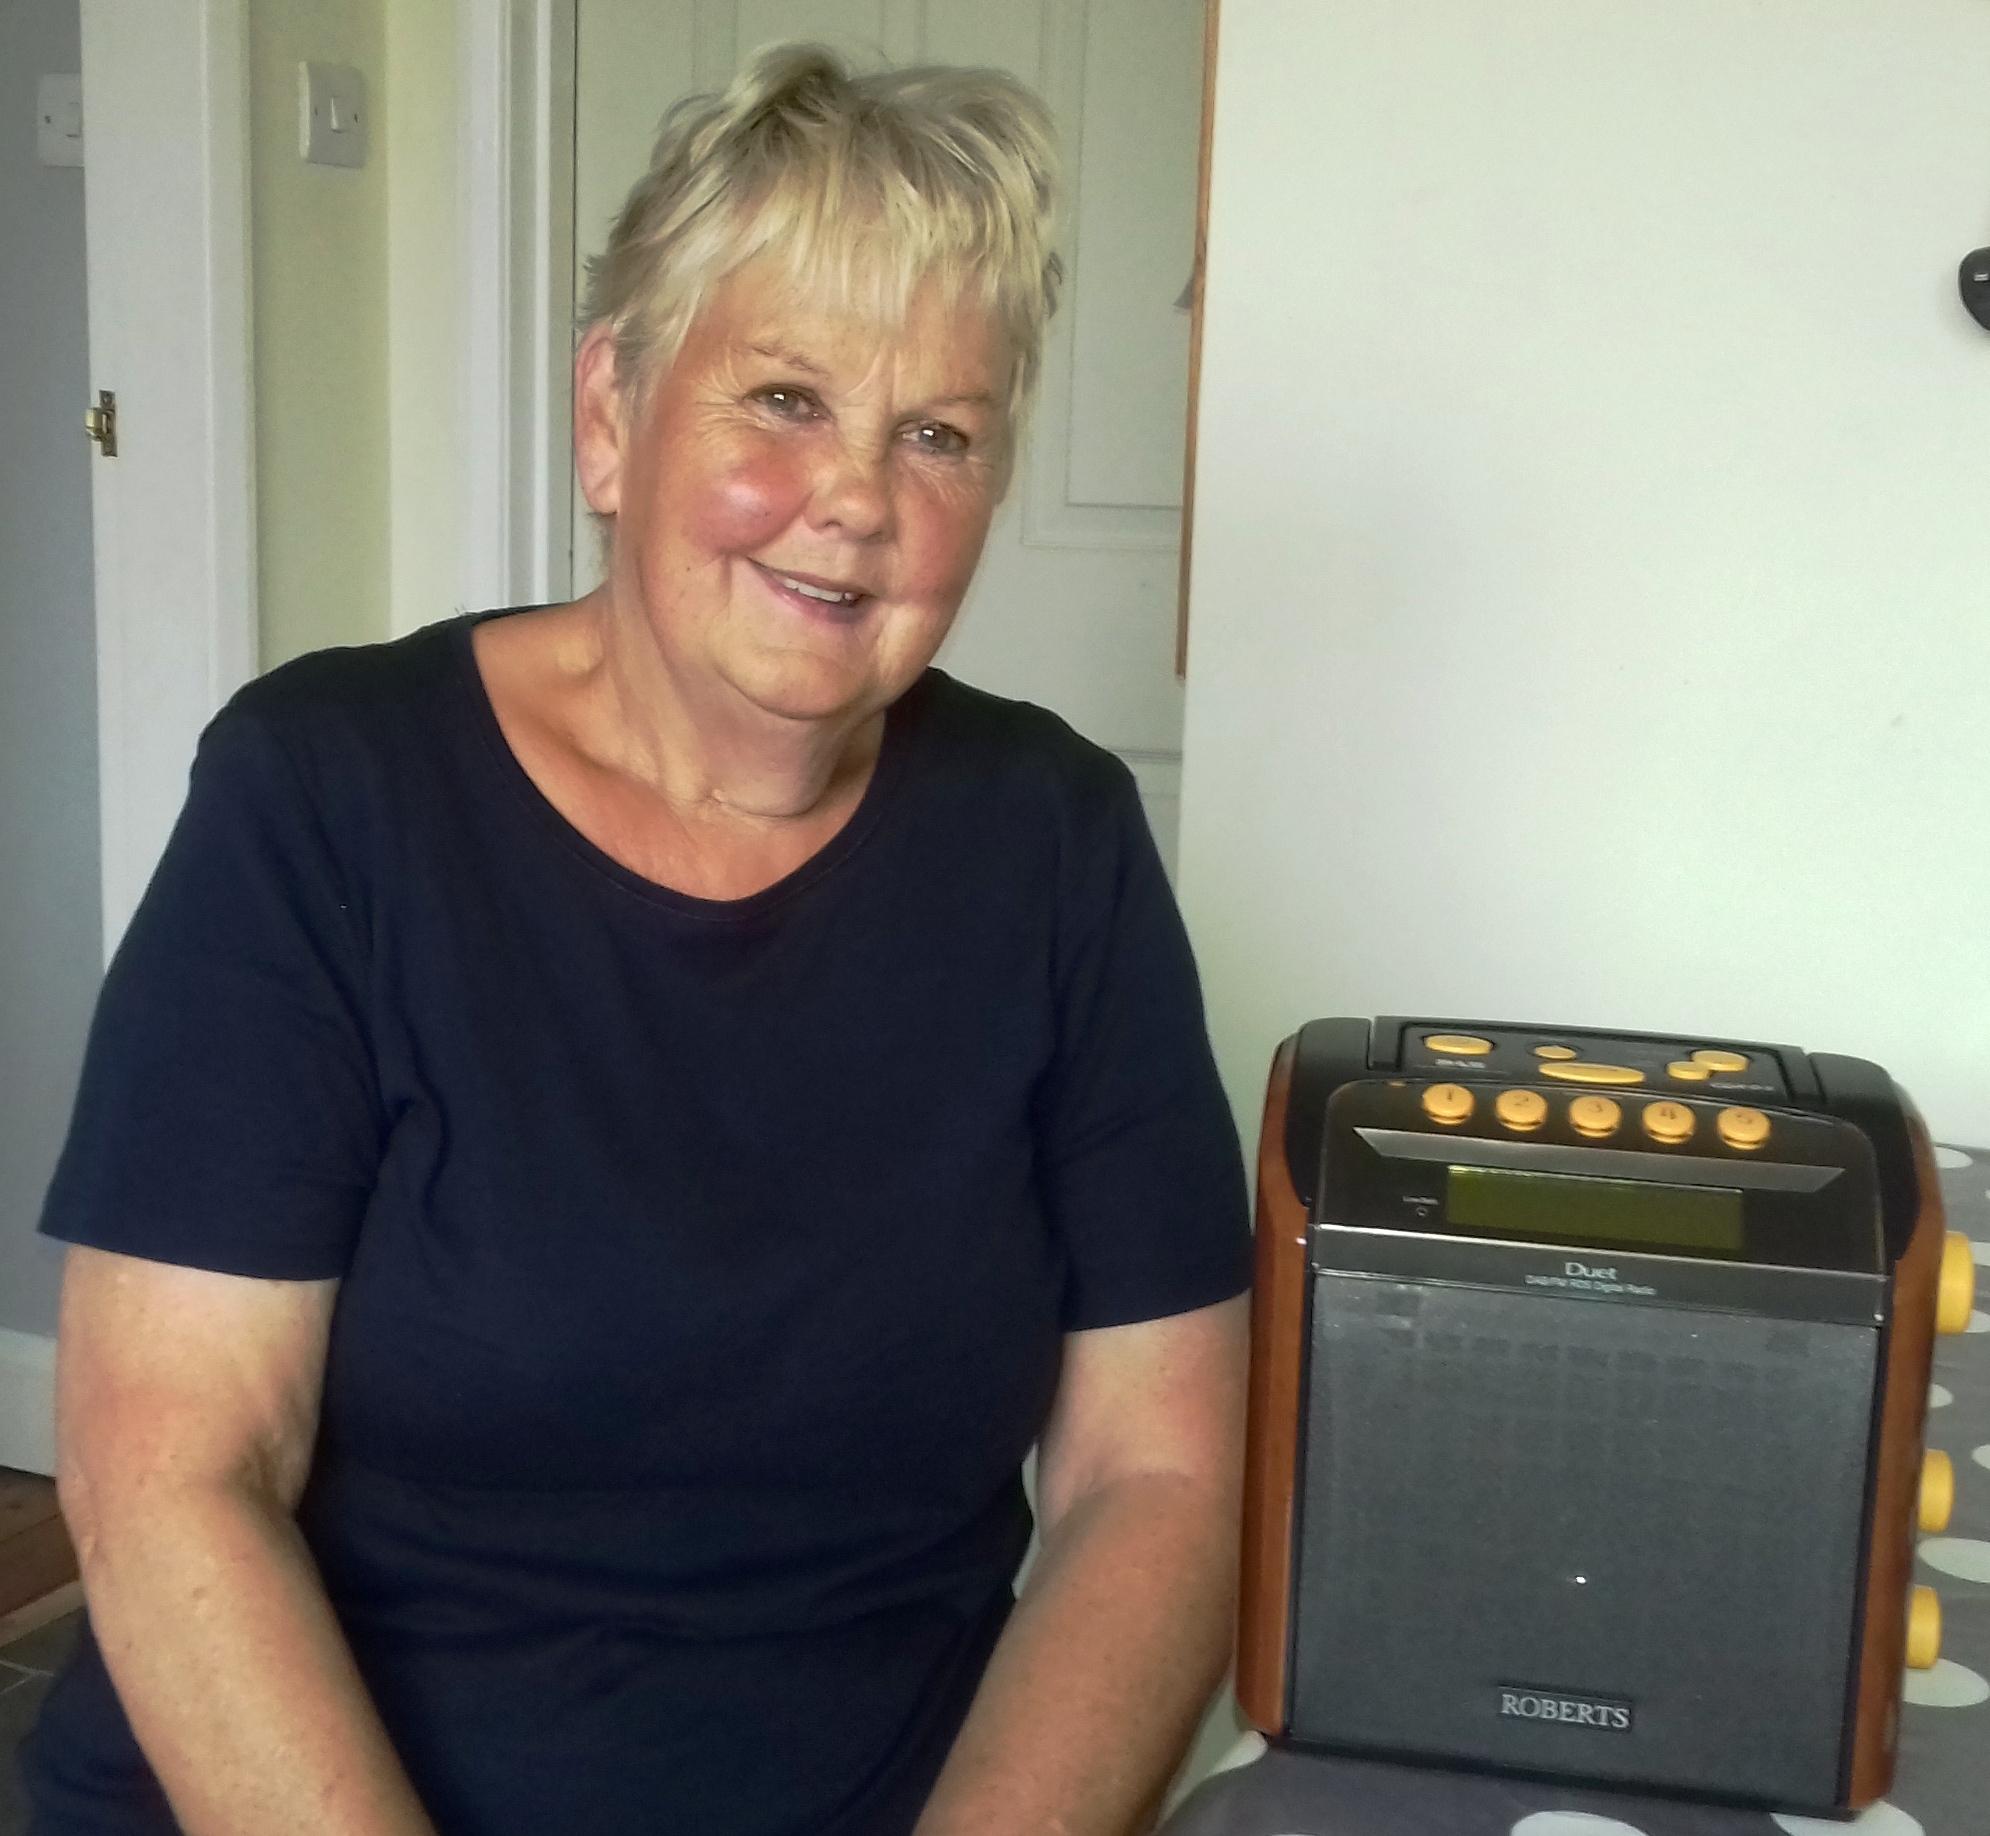 Free gadgets to help Swindon's blind community